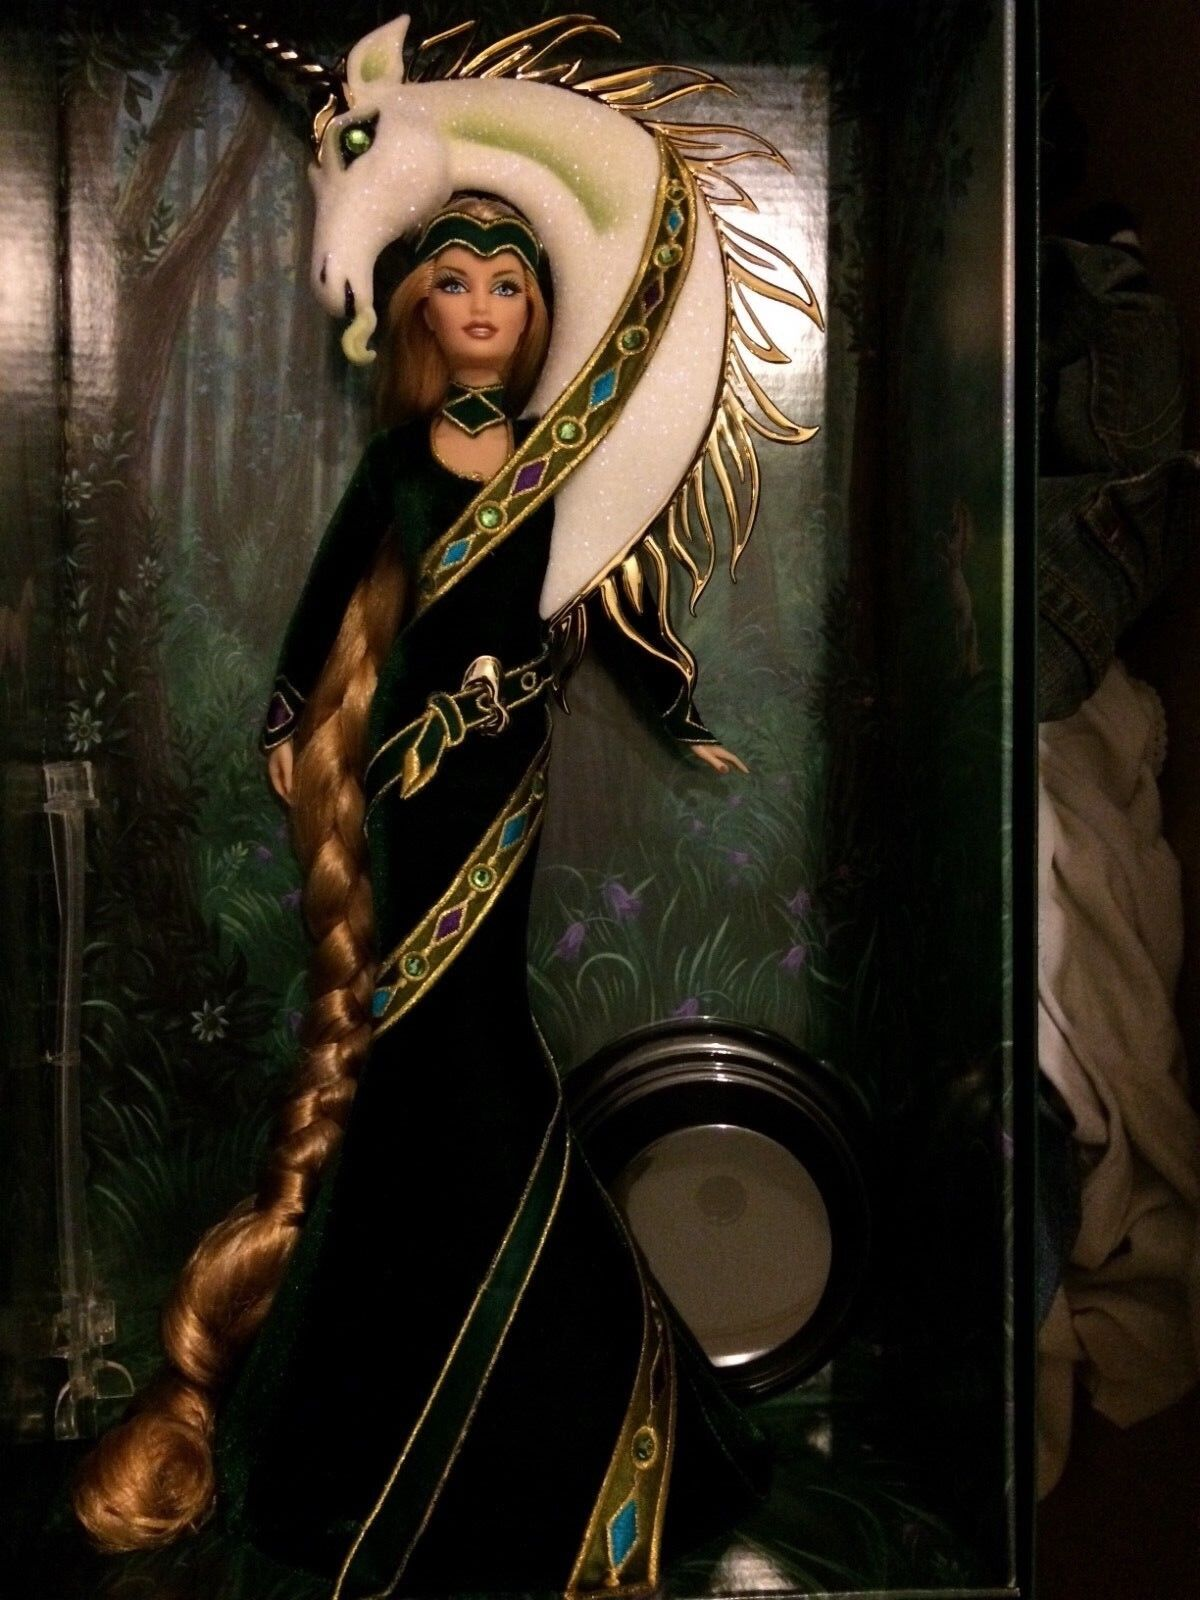 Gold label, Bob mackie, Lady of the unicorn barbie doll NRFB